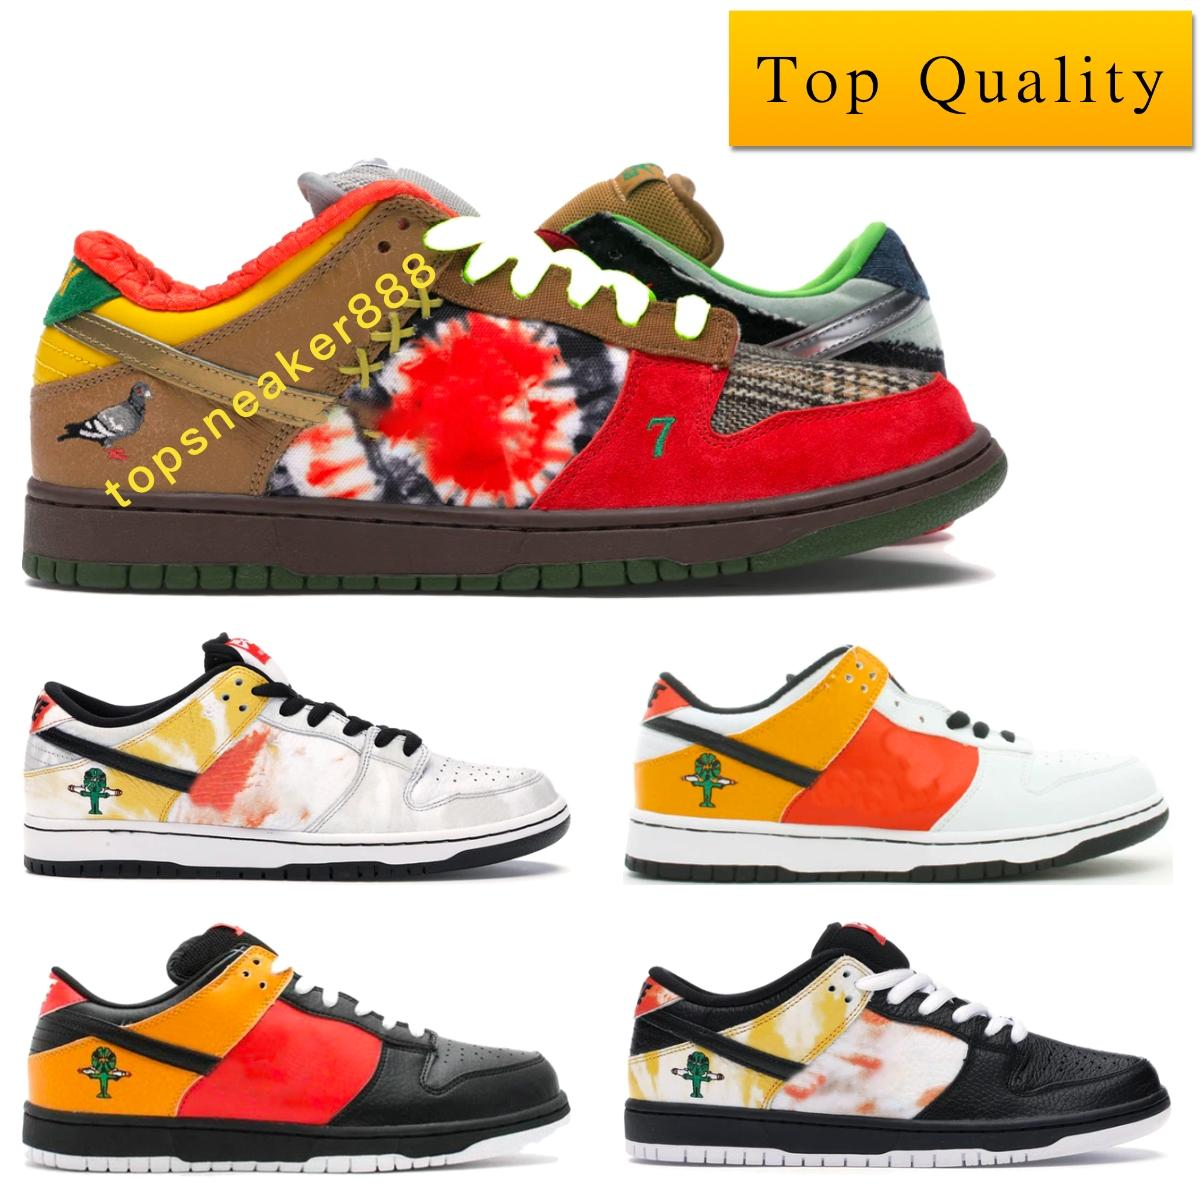 Dunk SB Low Raygun Sneakers Shoes أعلى جودة ما ويغمس رجل أحذية أحذية Raygun التعادل صبغ أسود أبيض الرئيسية النساء مع صندوق حجم 36-45